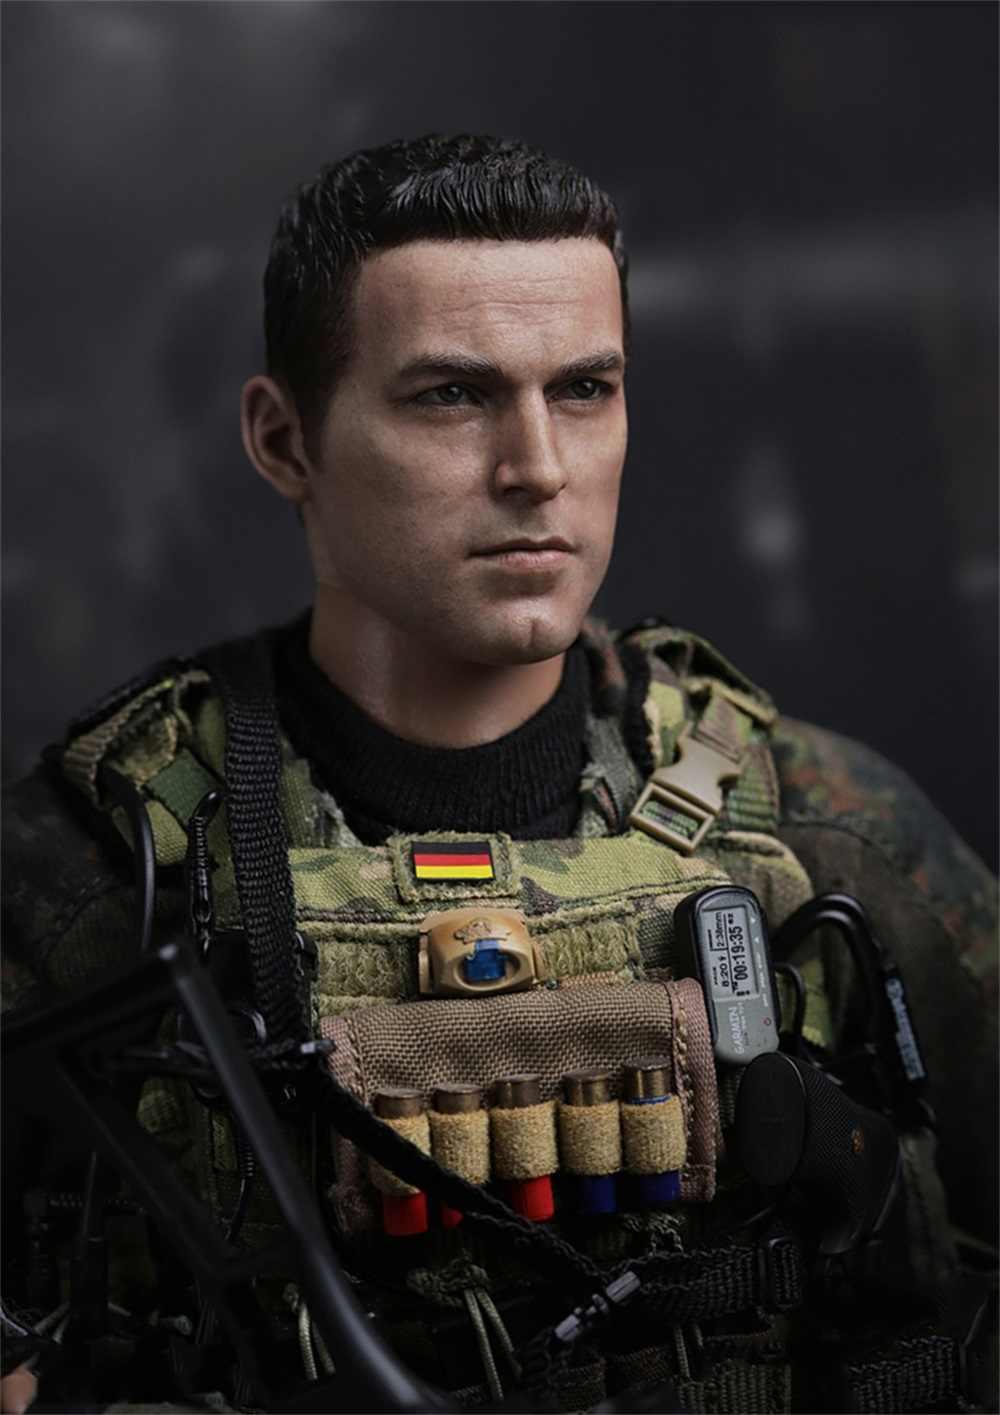 DAM 1//6 SCALE GERMAN KSK Kommando Spezialkrafte ASSAULTER Casque Set 78037